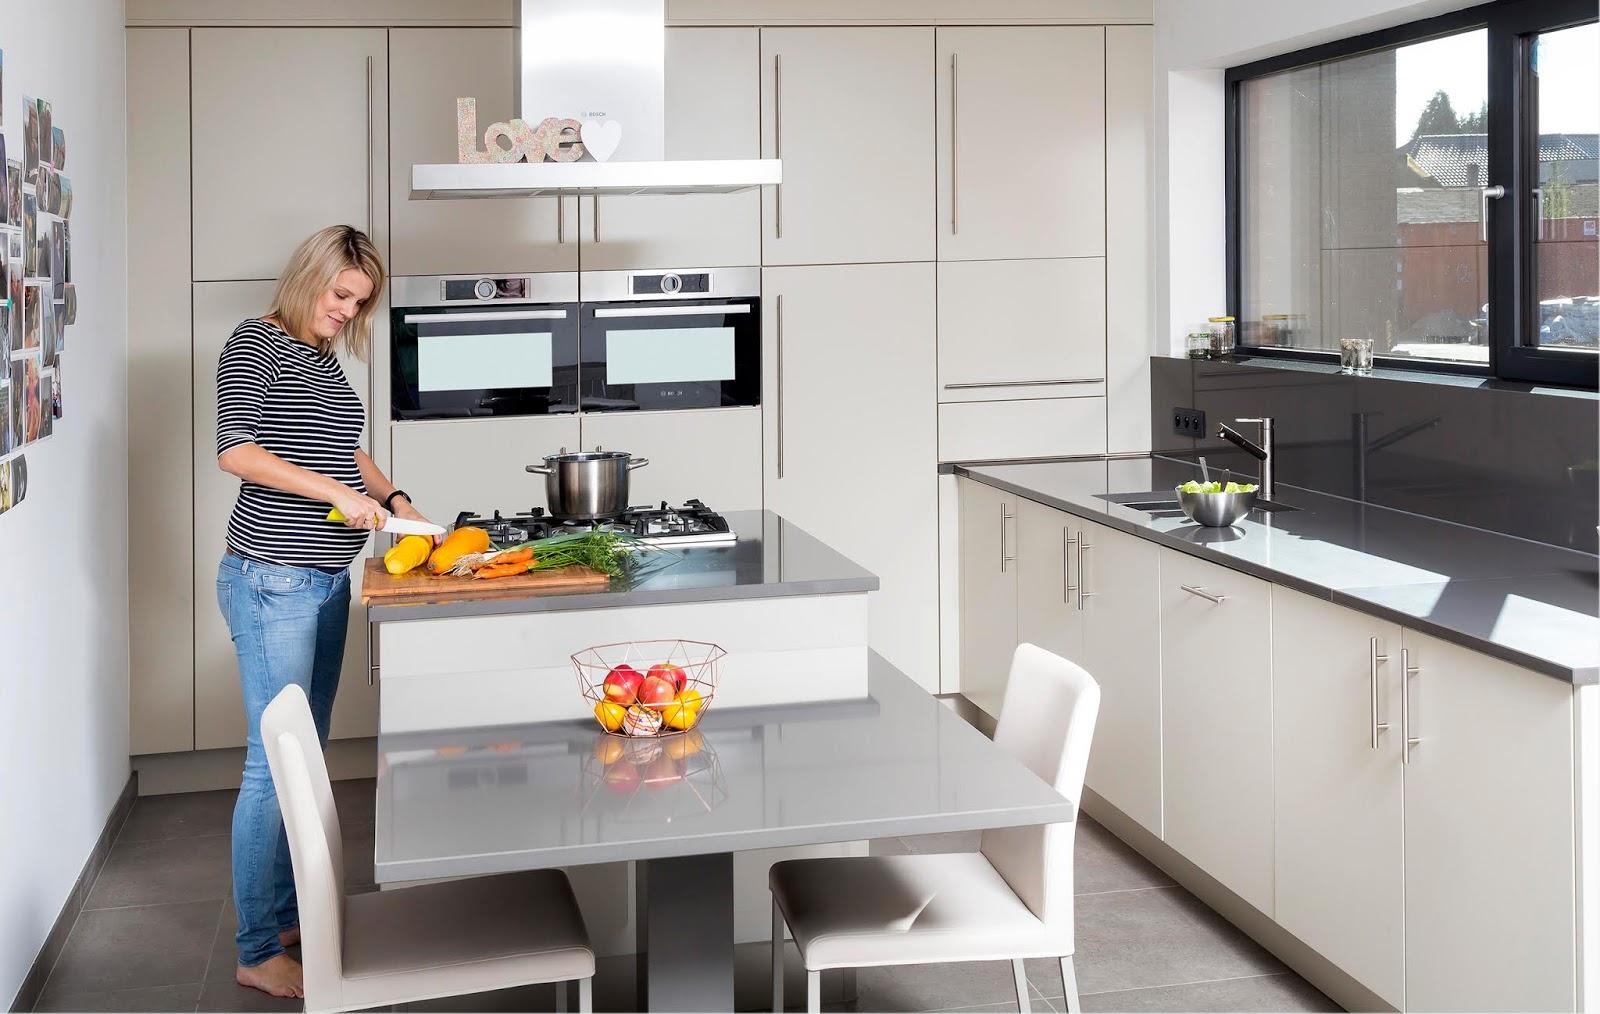 Keuken Wandkast 8 : Wat is een keukenkast de grote keukengids